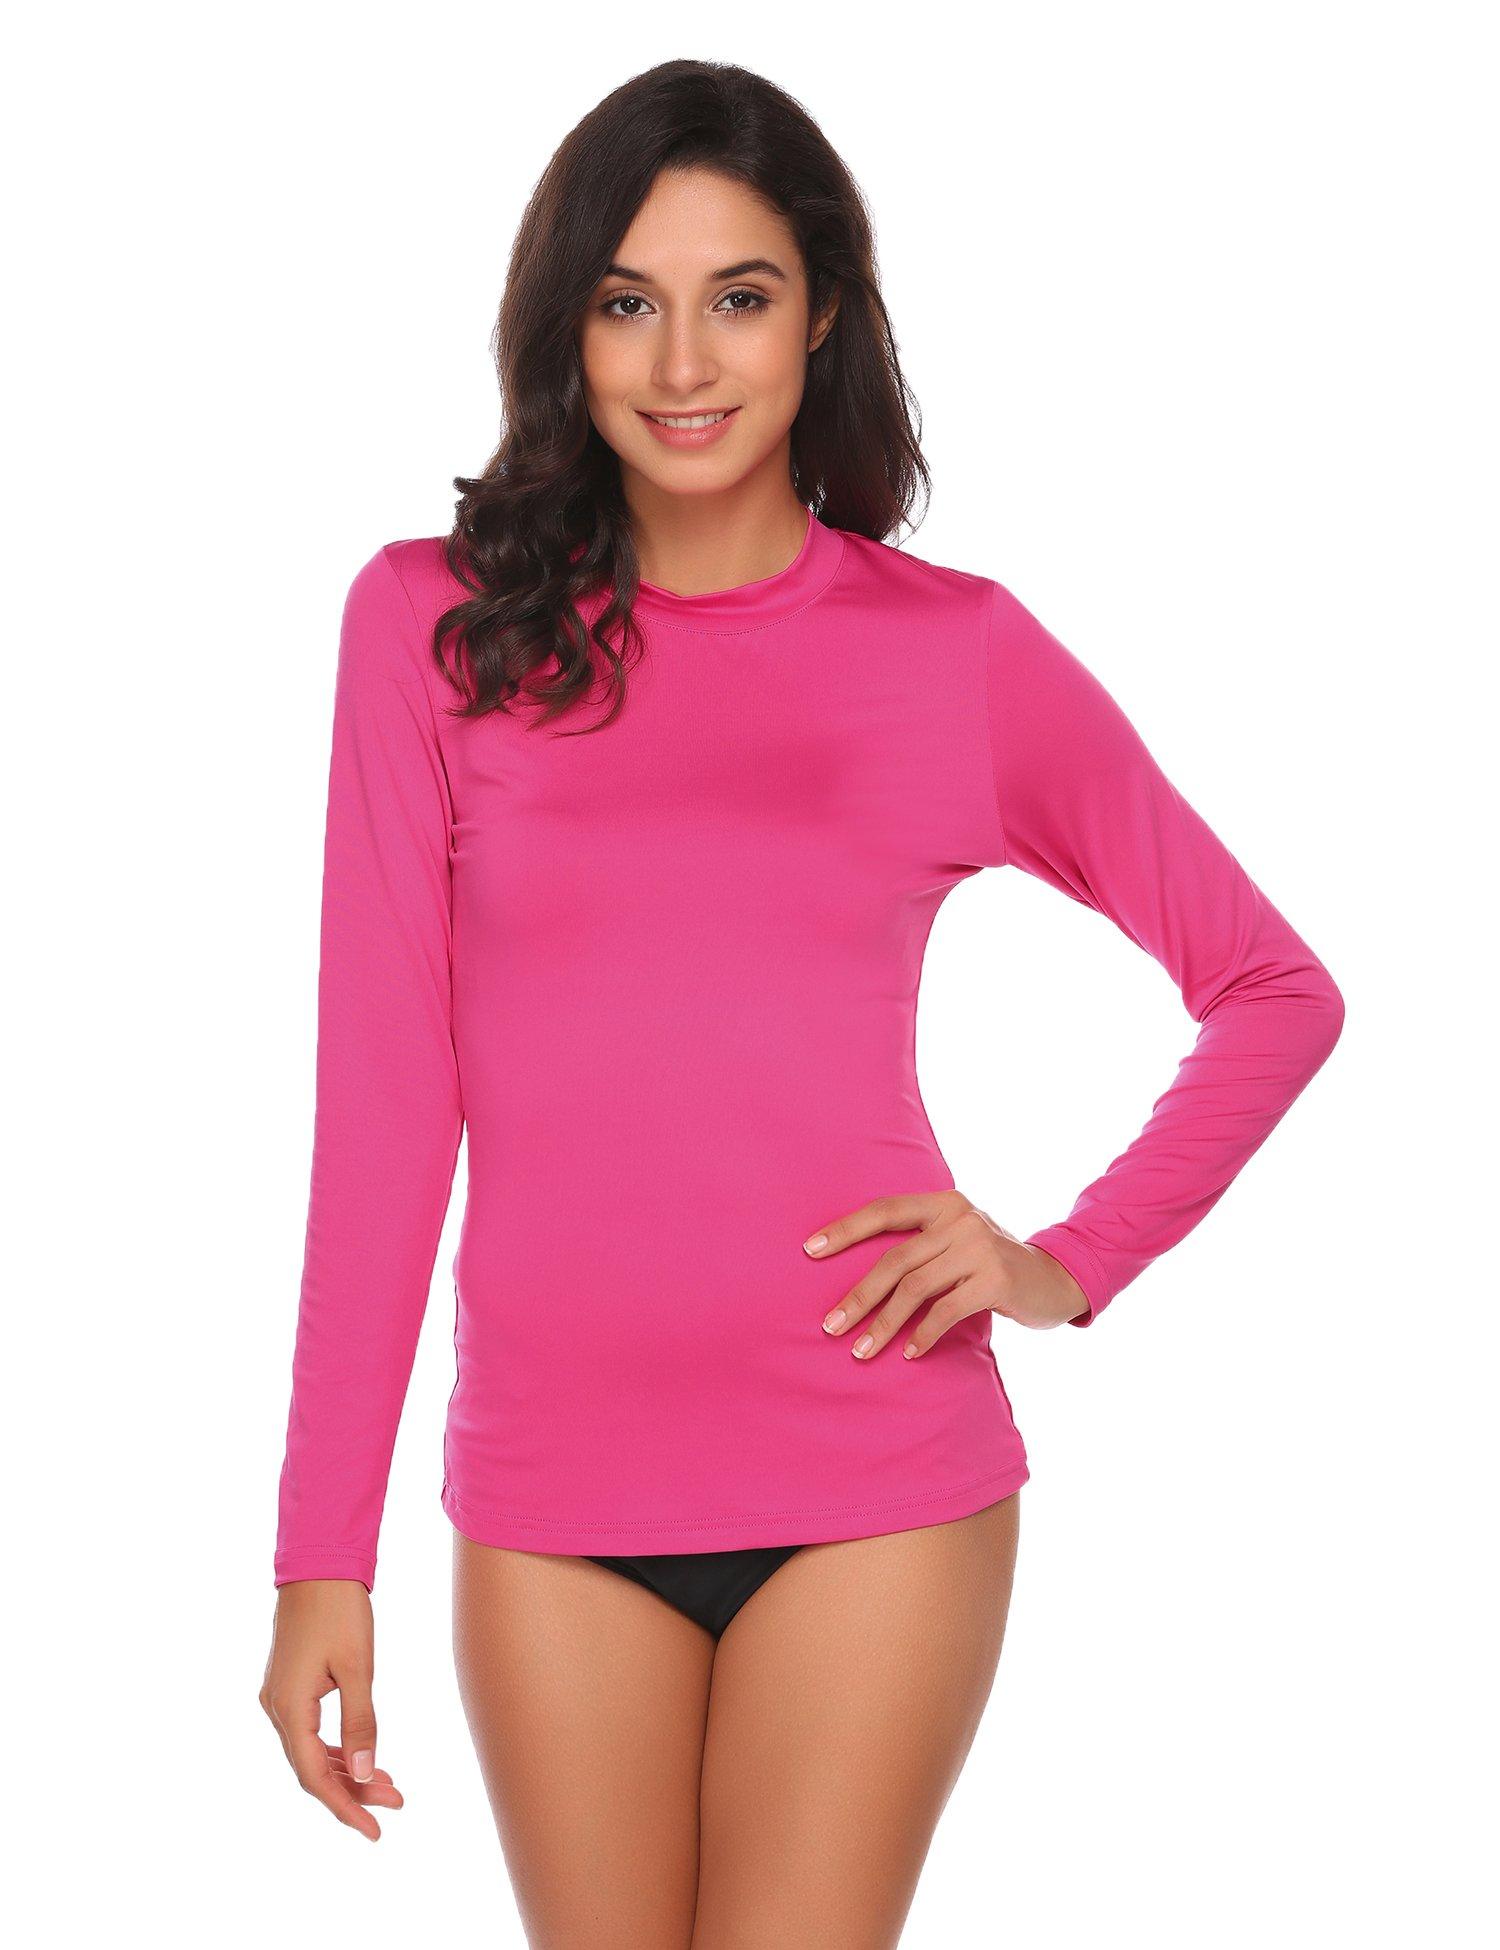 Zeagoo Women's Long Sleeve Swimwear Tops UV Sun Protection Rash Guard Surf Shirts Rashguard Top